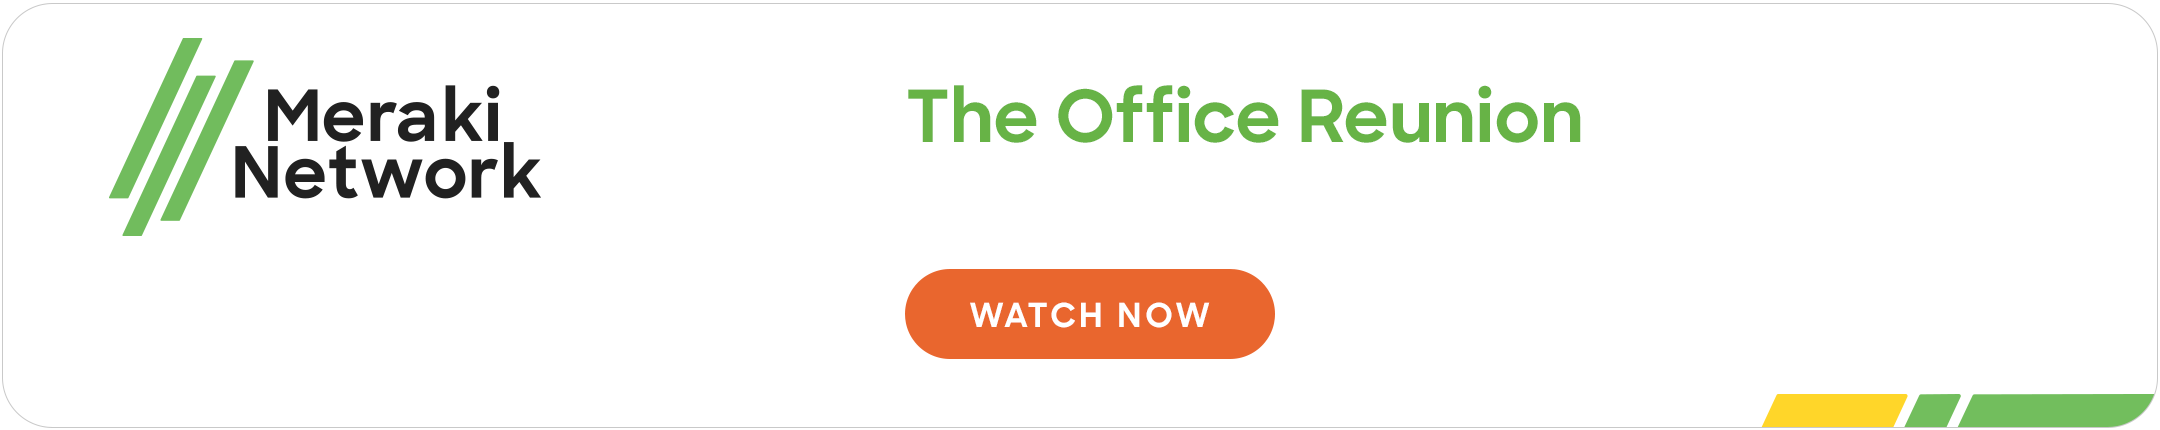 Meraki Network: The office reunion